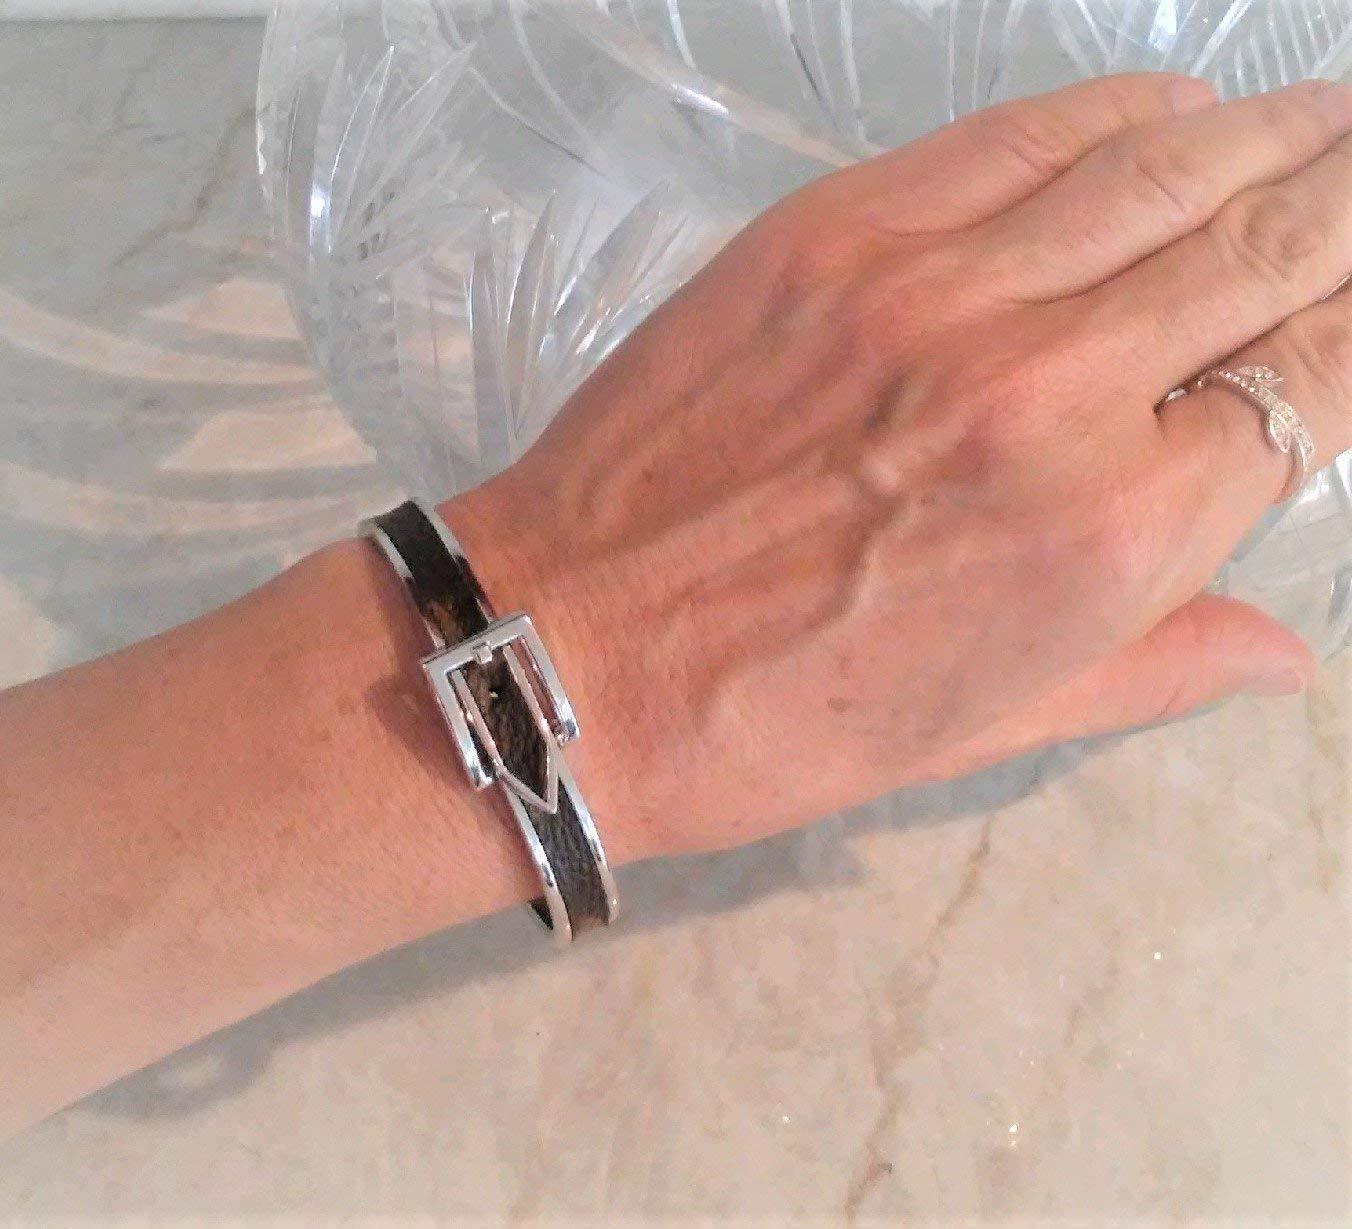 9780b5f9910 Amazon.com  Buckle Bracelet w Louis Vuitton monogram upcycle repurpose.  SILVER TONE  Handmade